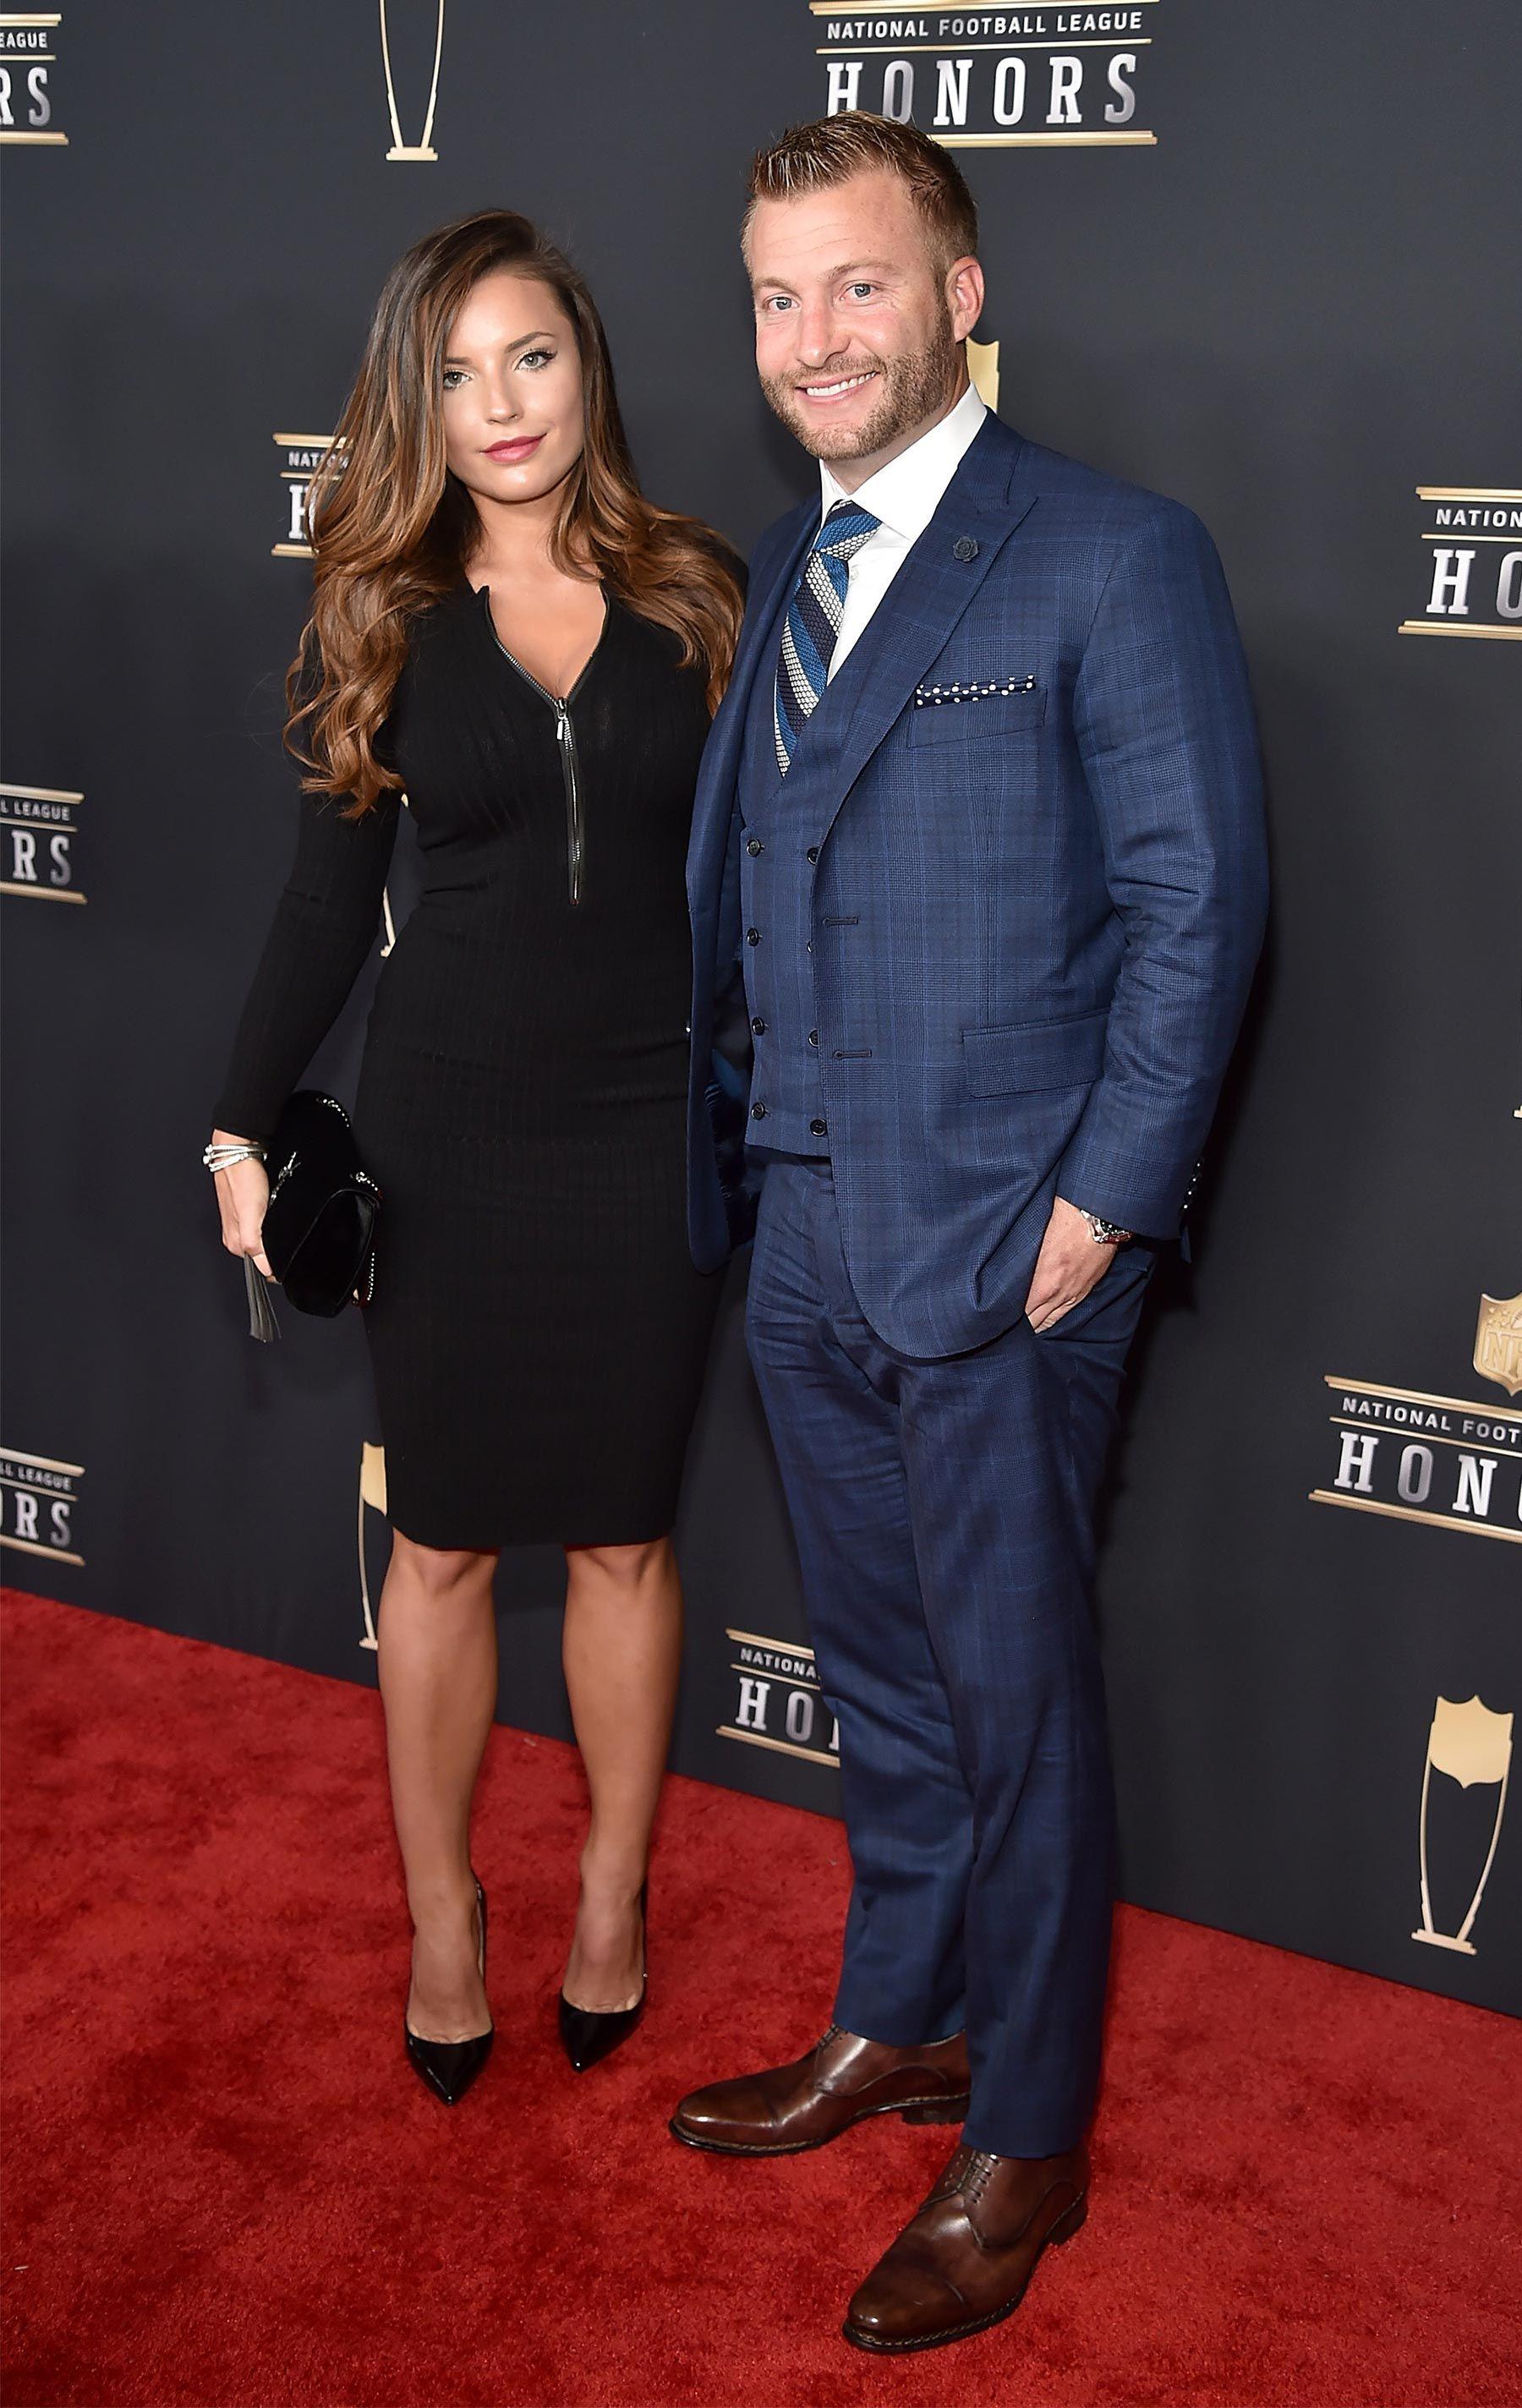 Los Angeles Rams Coach Sean Mcvay Engaged To Model Girlfriend Veronika Khomyn Sean Mcvay Nfl Coaches Model